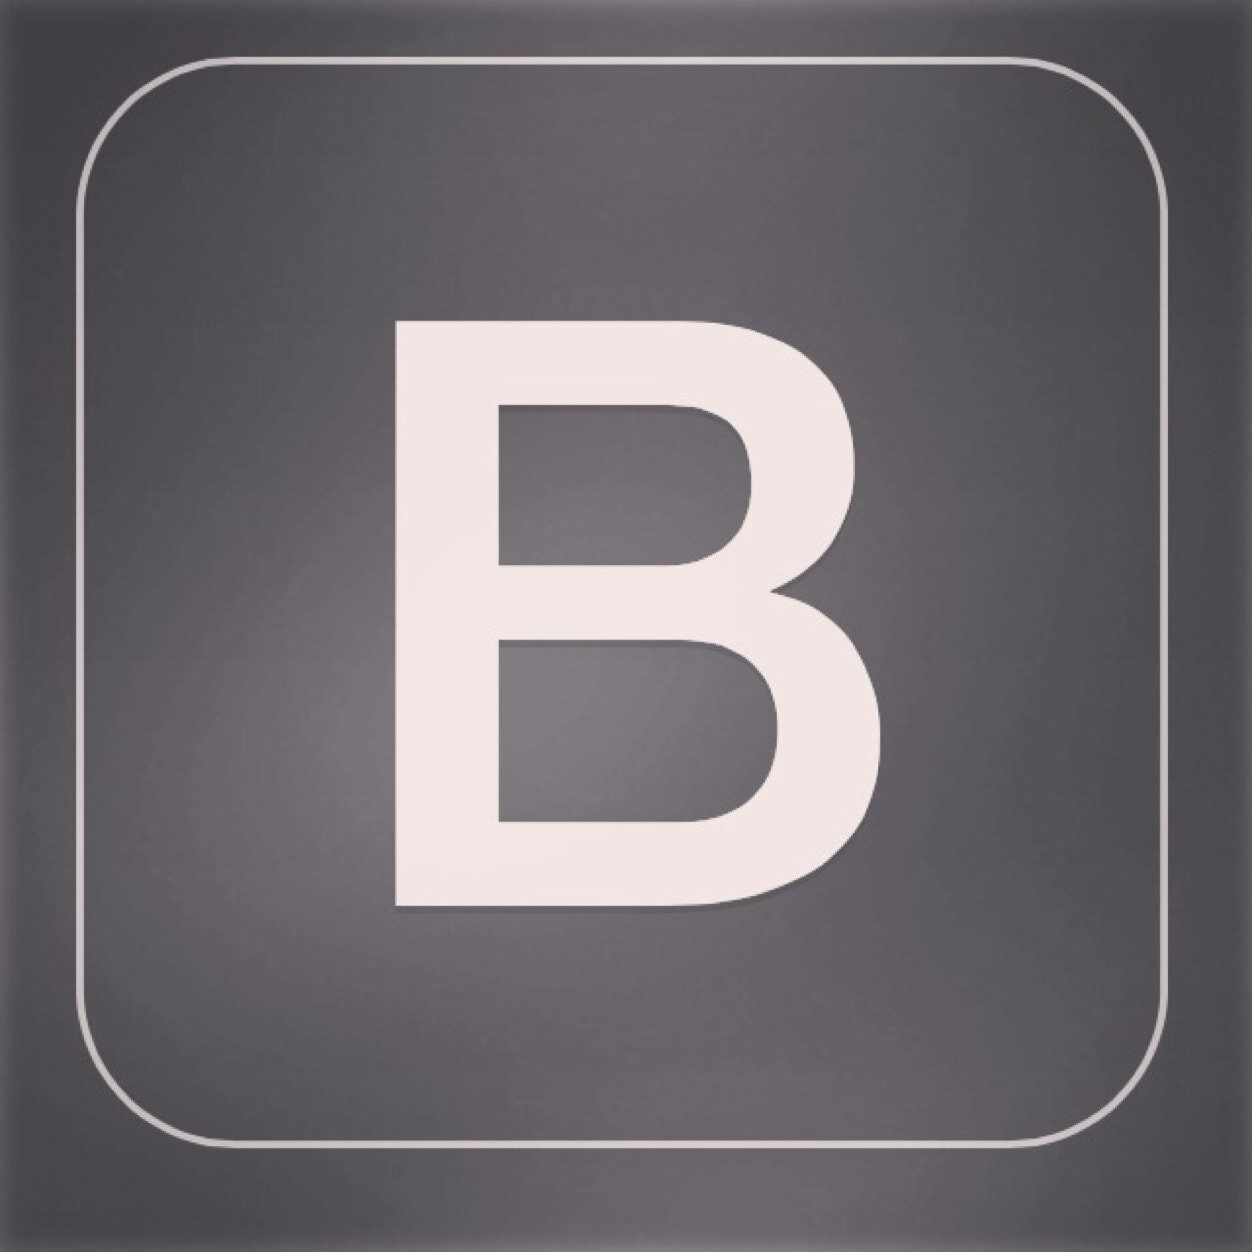 BootstrapNews